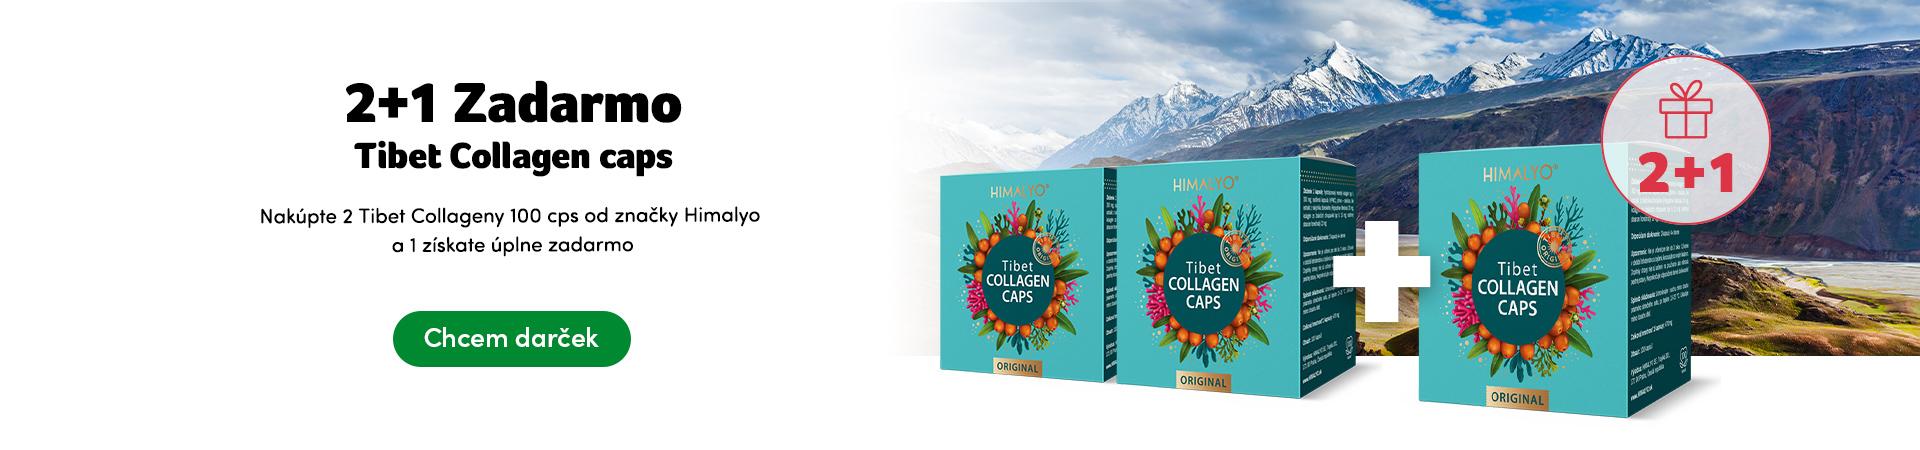 Darček Tibet Collagen 2+1